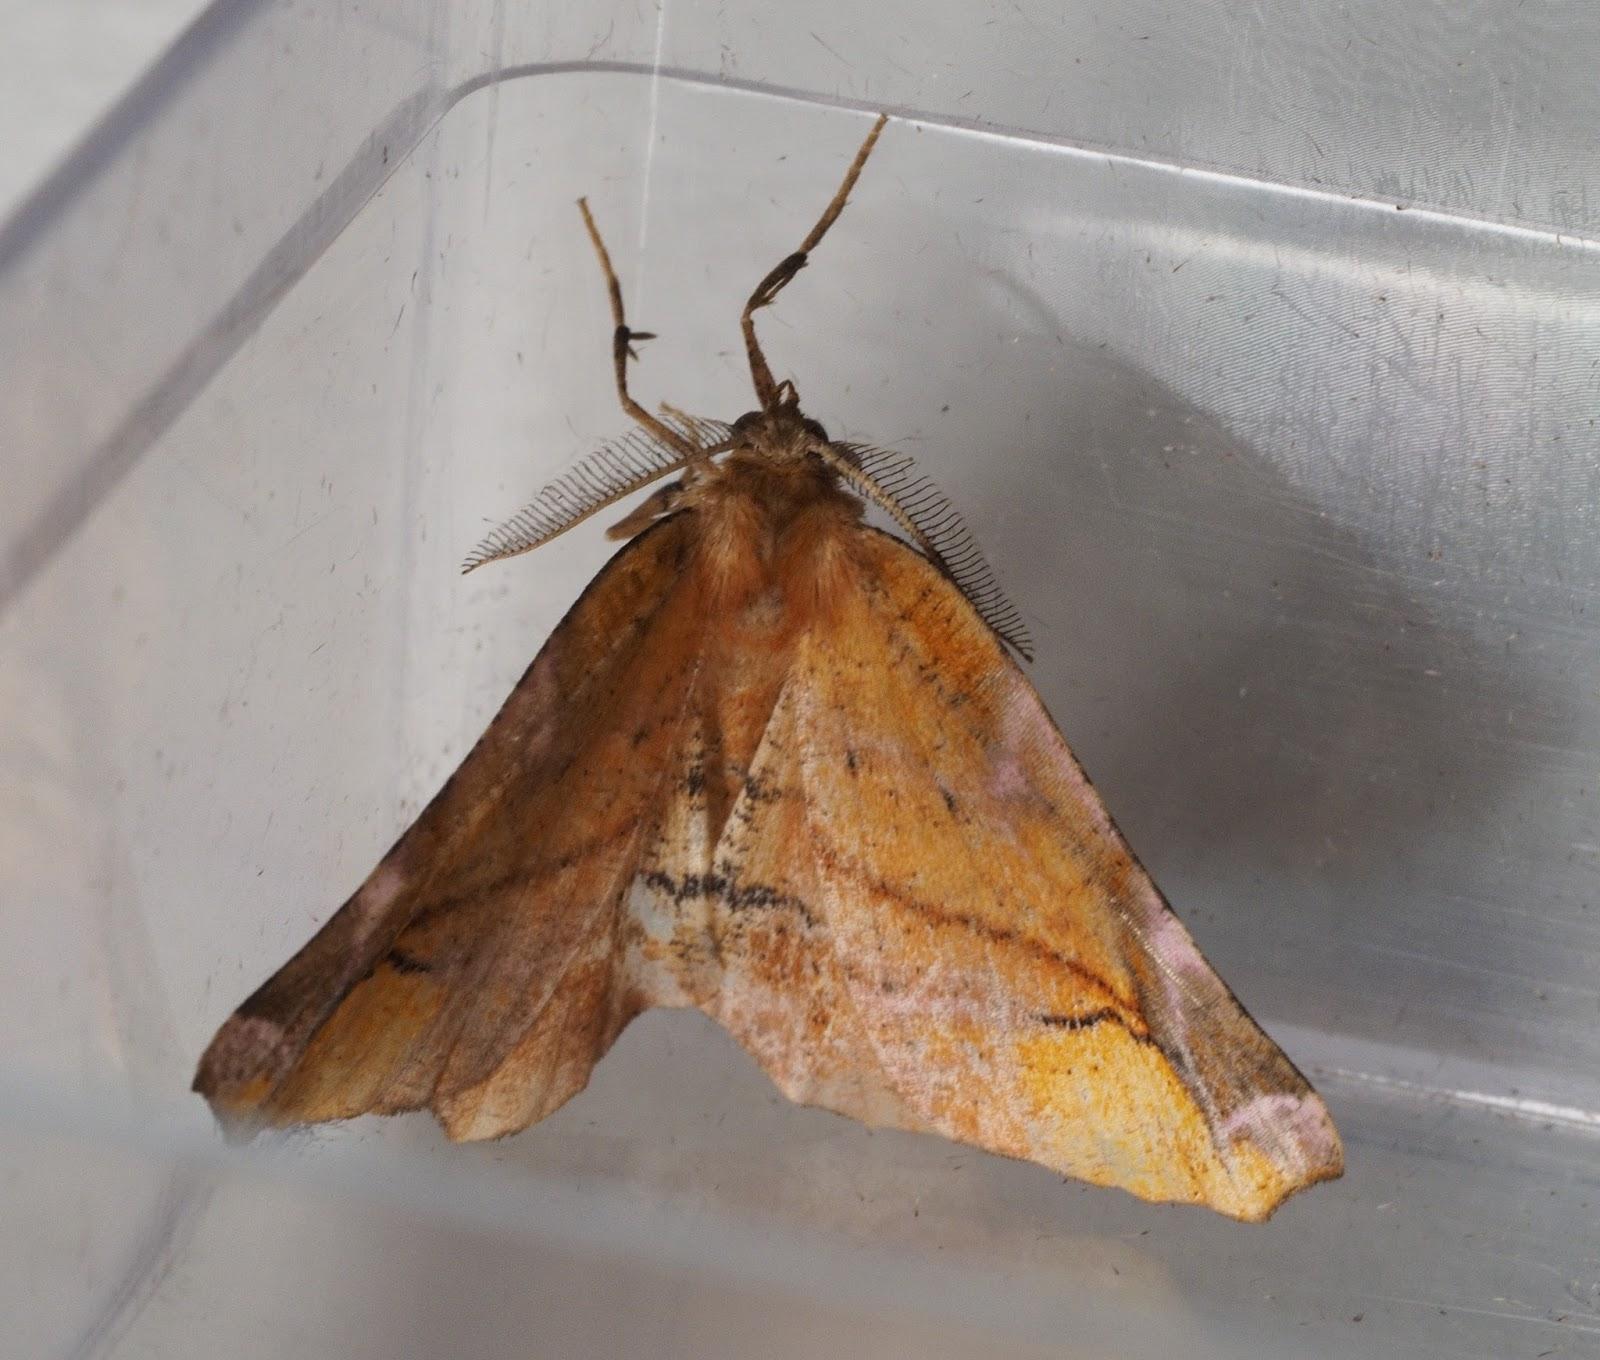 Upper Thames Moths: Some new garden moths and a query